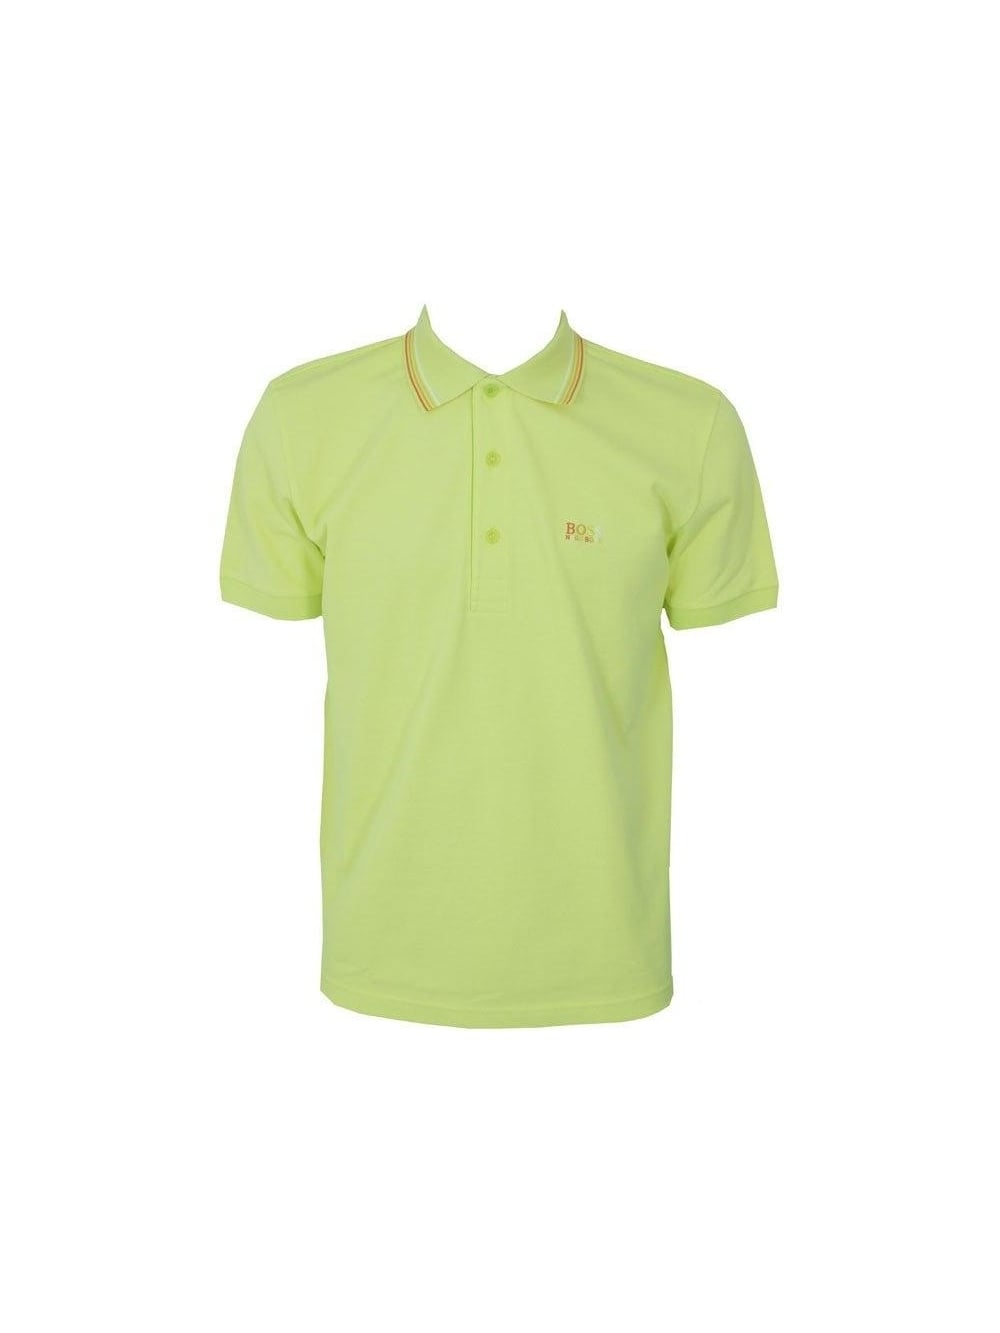 Sale Pastel Yellow Polo Shirt D720f E00c6